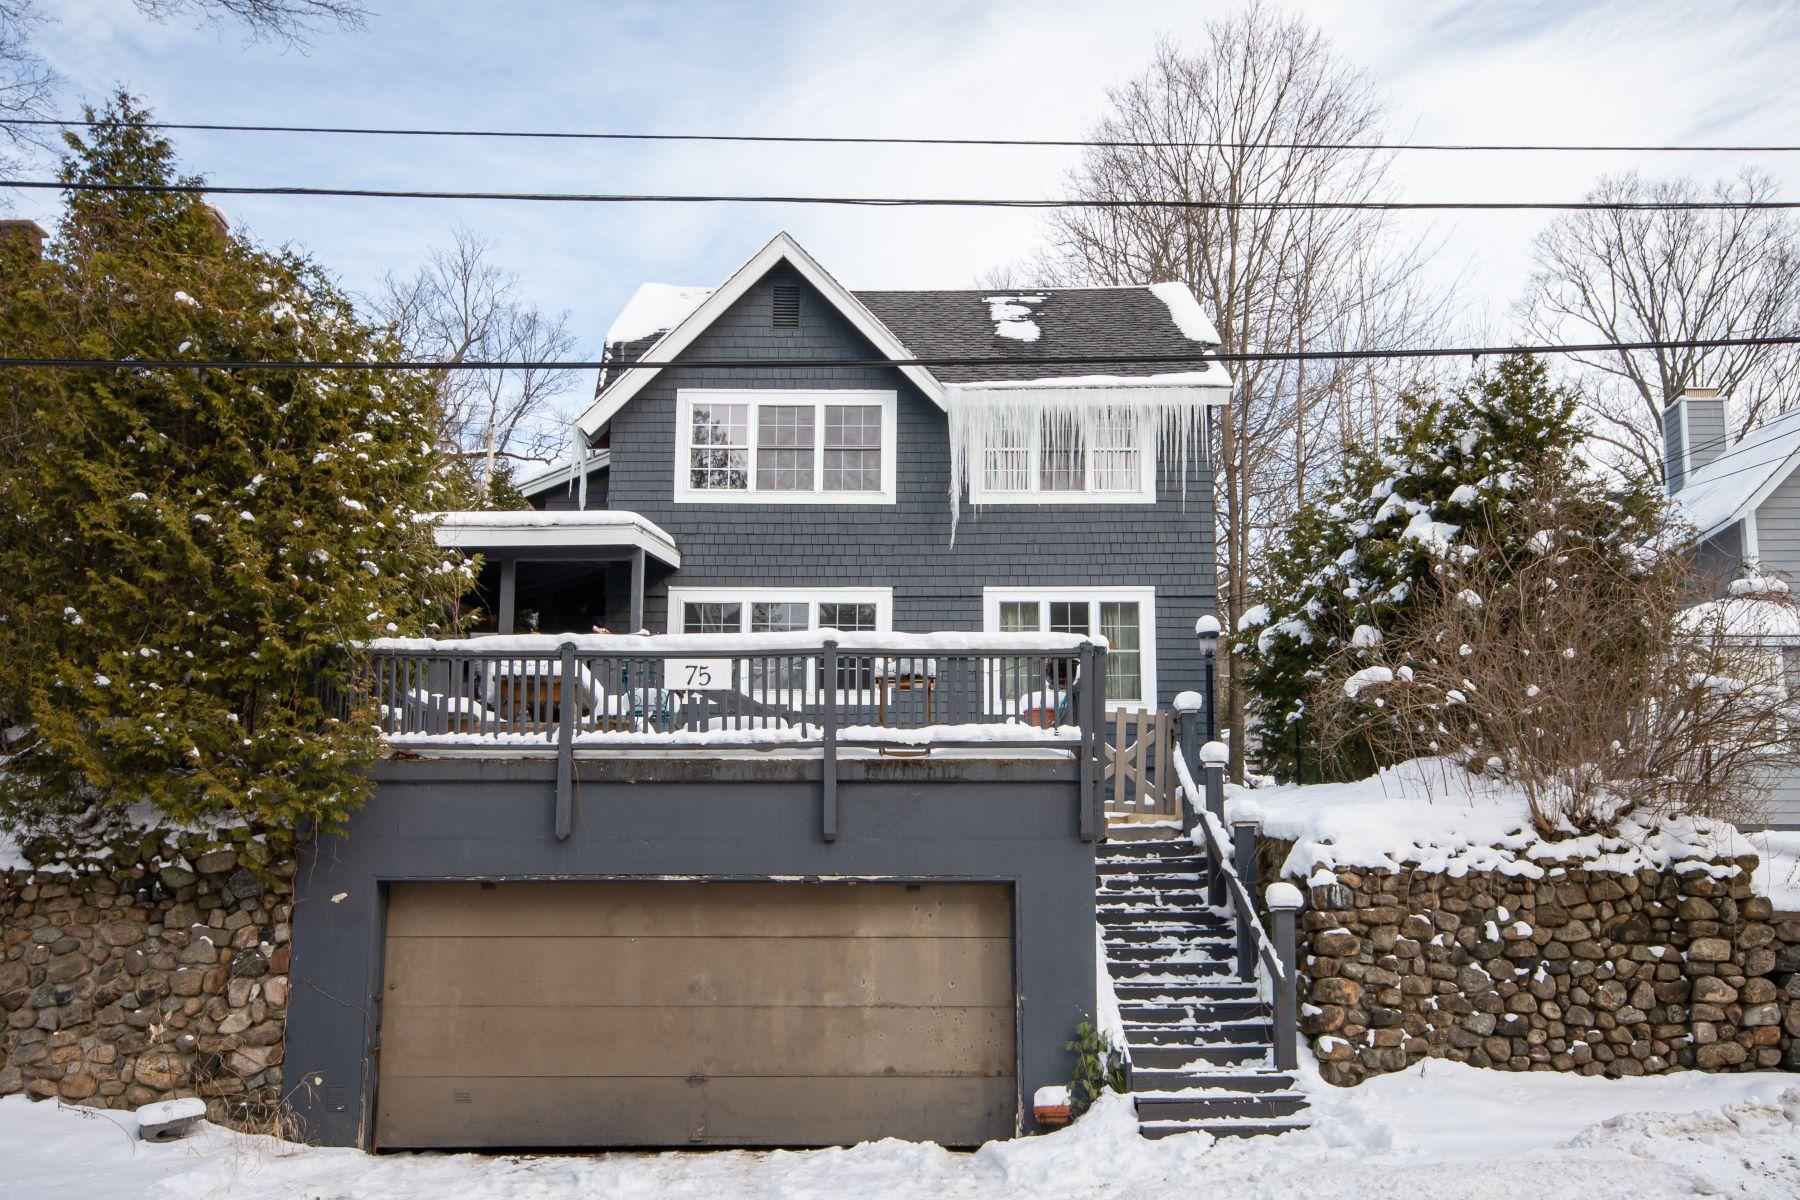 Multi-Family Homes for Sale at Village Duplex 75 Margaret St Saranac Lake, New York 12983 United States